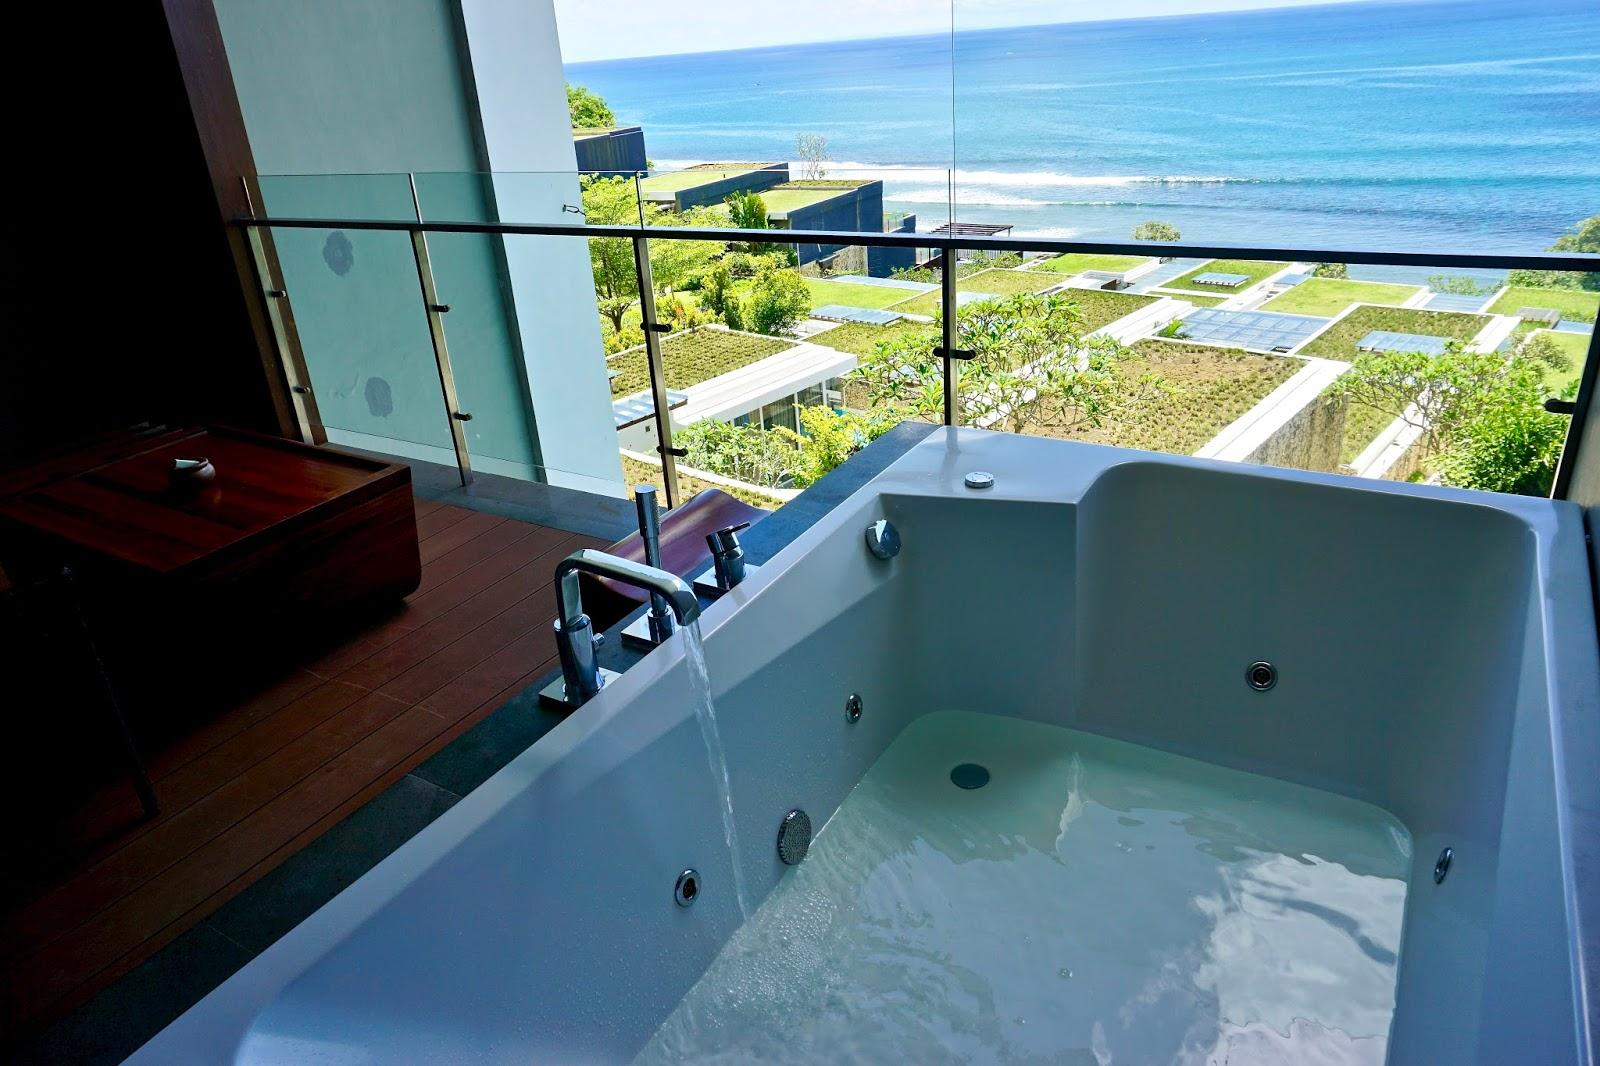 Luxurious Staycation at Anantara Resort, Uluwatu - Bali - STELLANGELITA